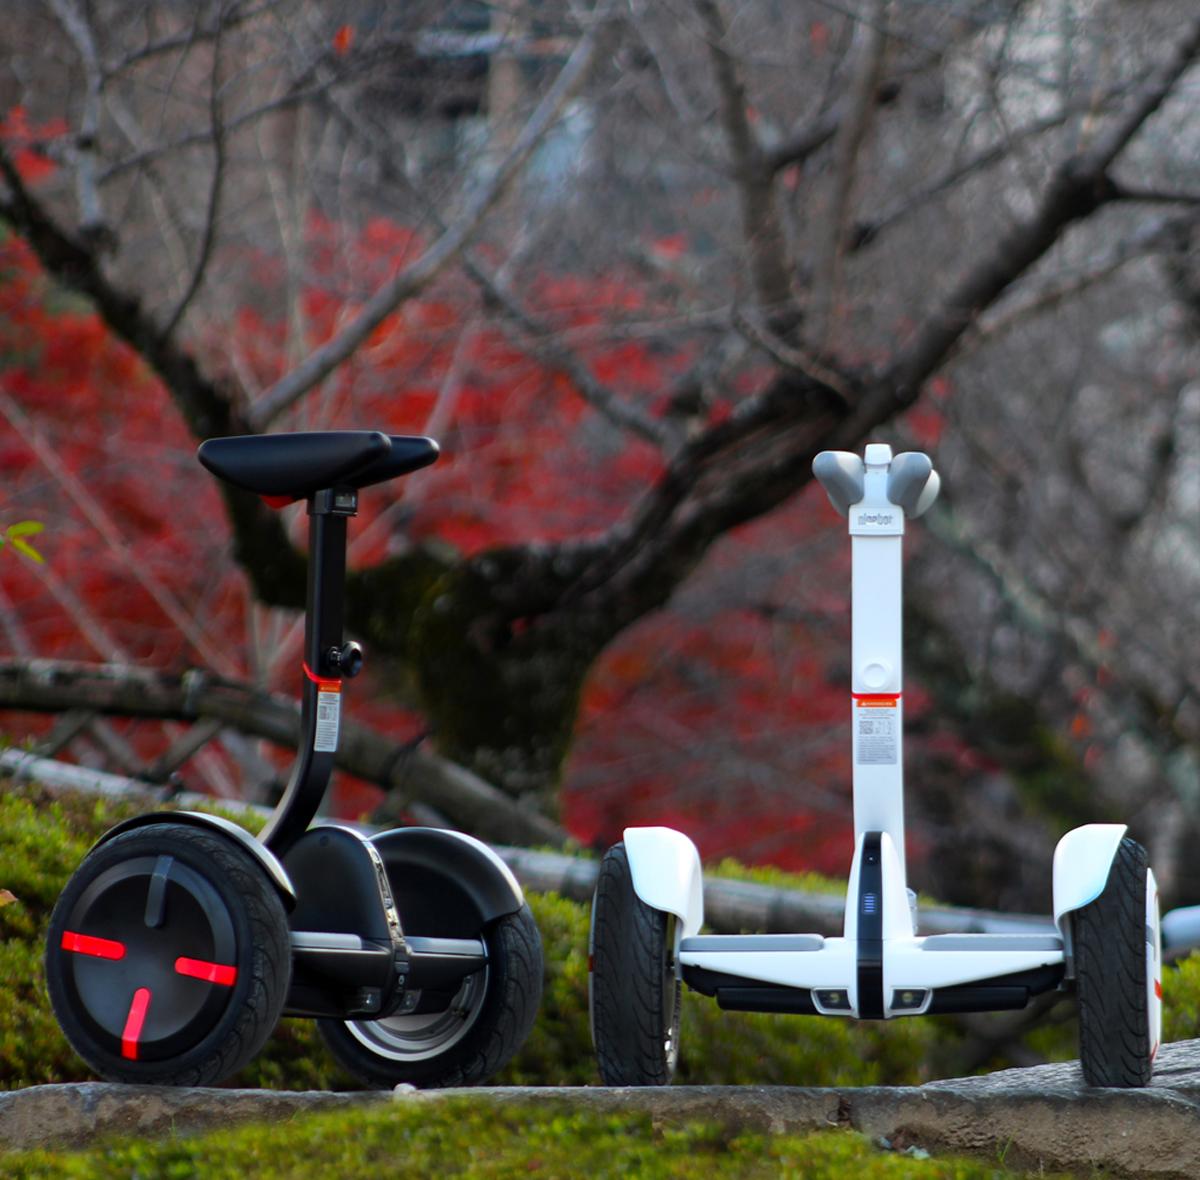 Ninebot mini Proナインボットミニプロ送料無料(北海道、沖縄、離島は5,000円)